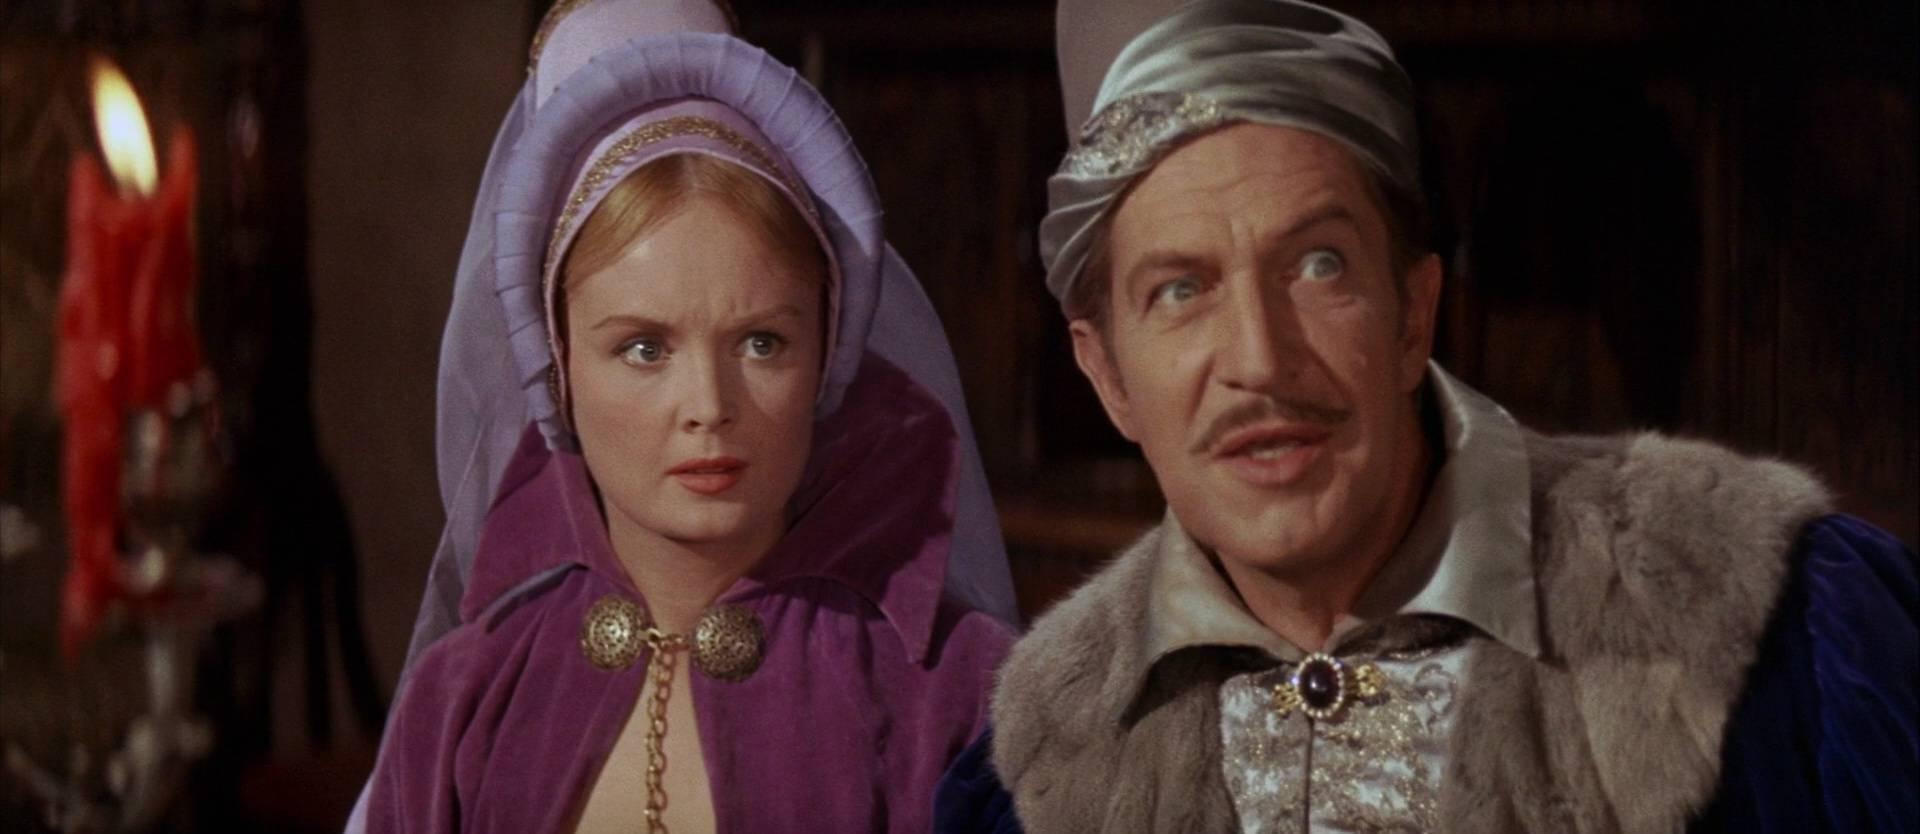 The Raven (1963)